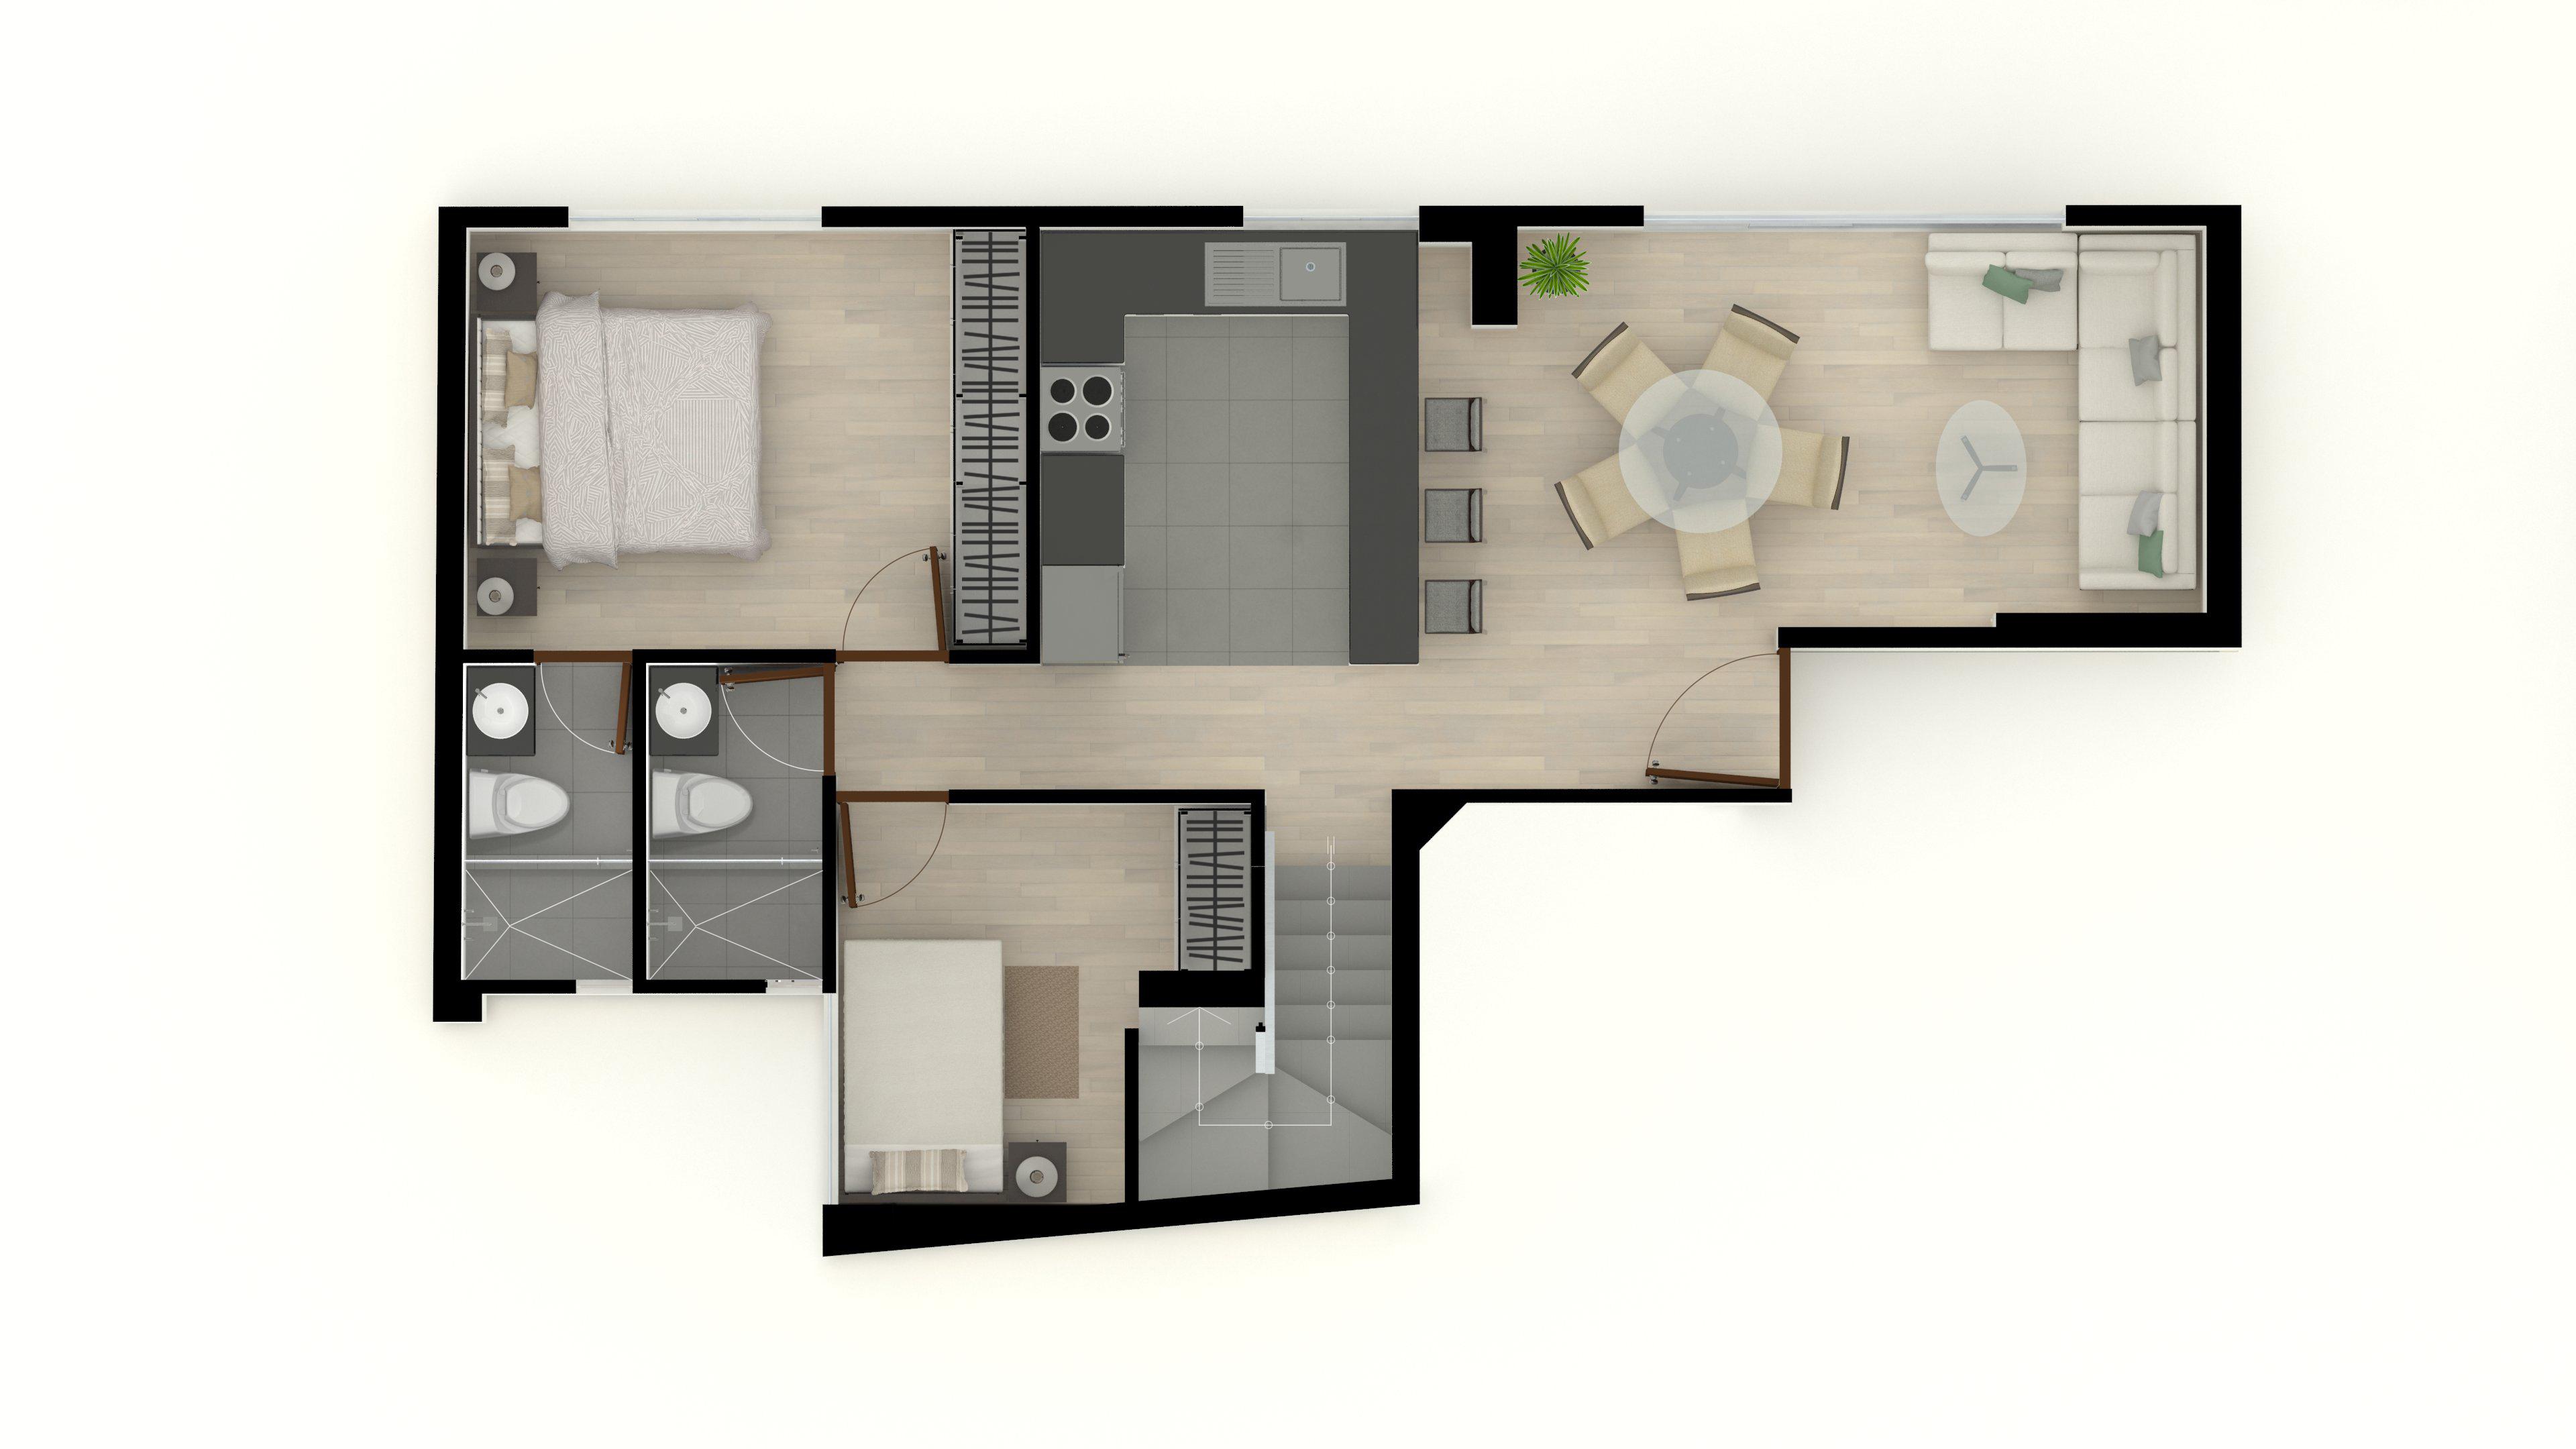 6. Duplex 502 5to piso 68m2 (Primer Nivel)